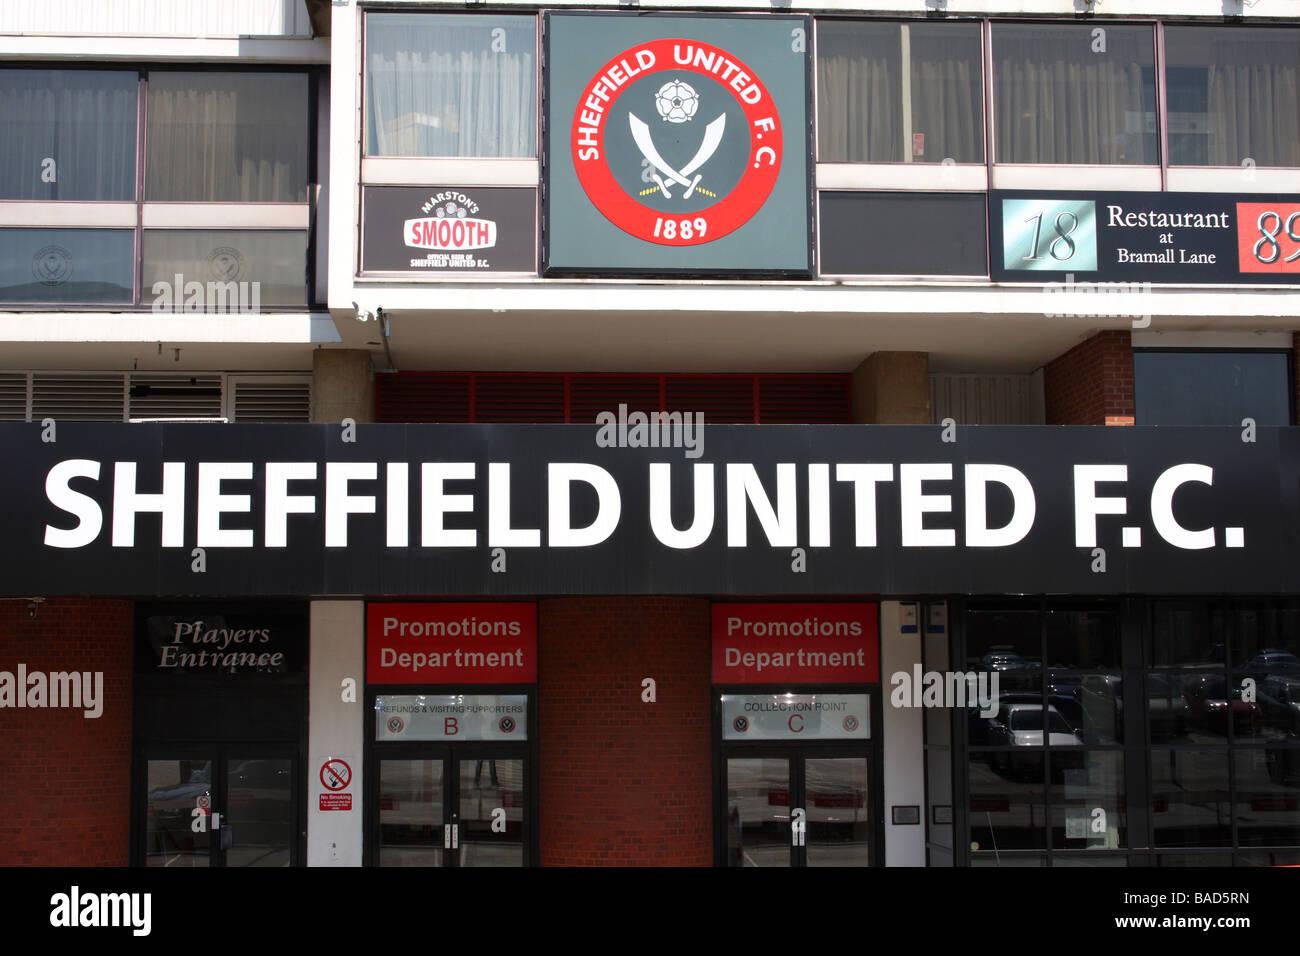 Sheffield United Football Club, Bramall Lane, Sheffield, South Yorkshire, England, U.K. - Stock Image